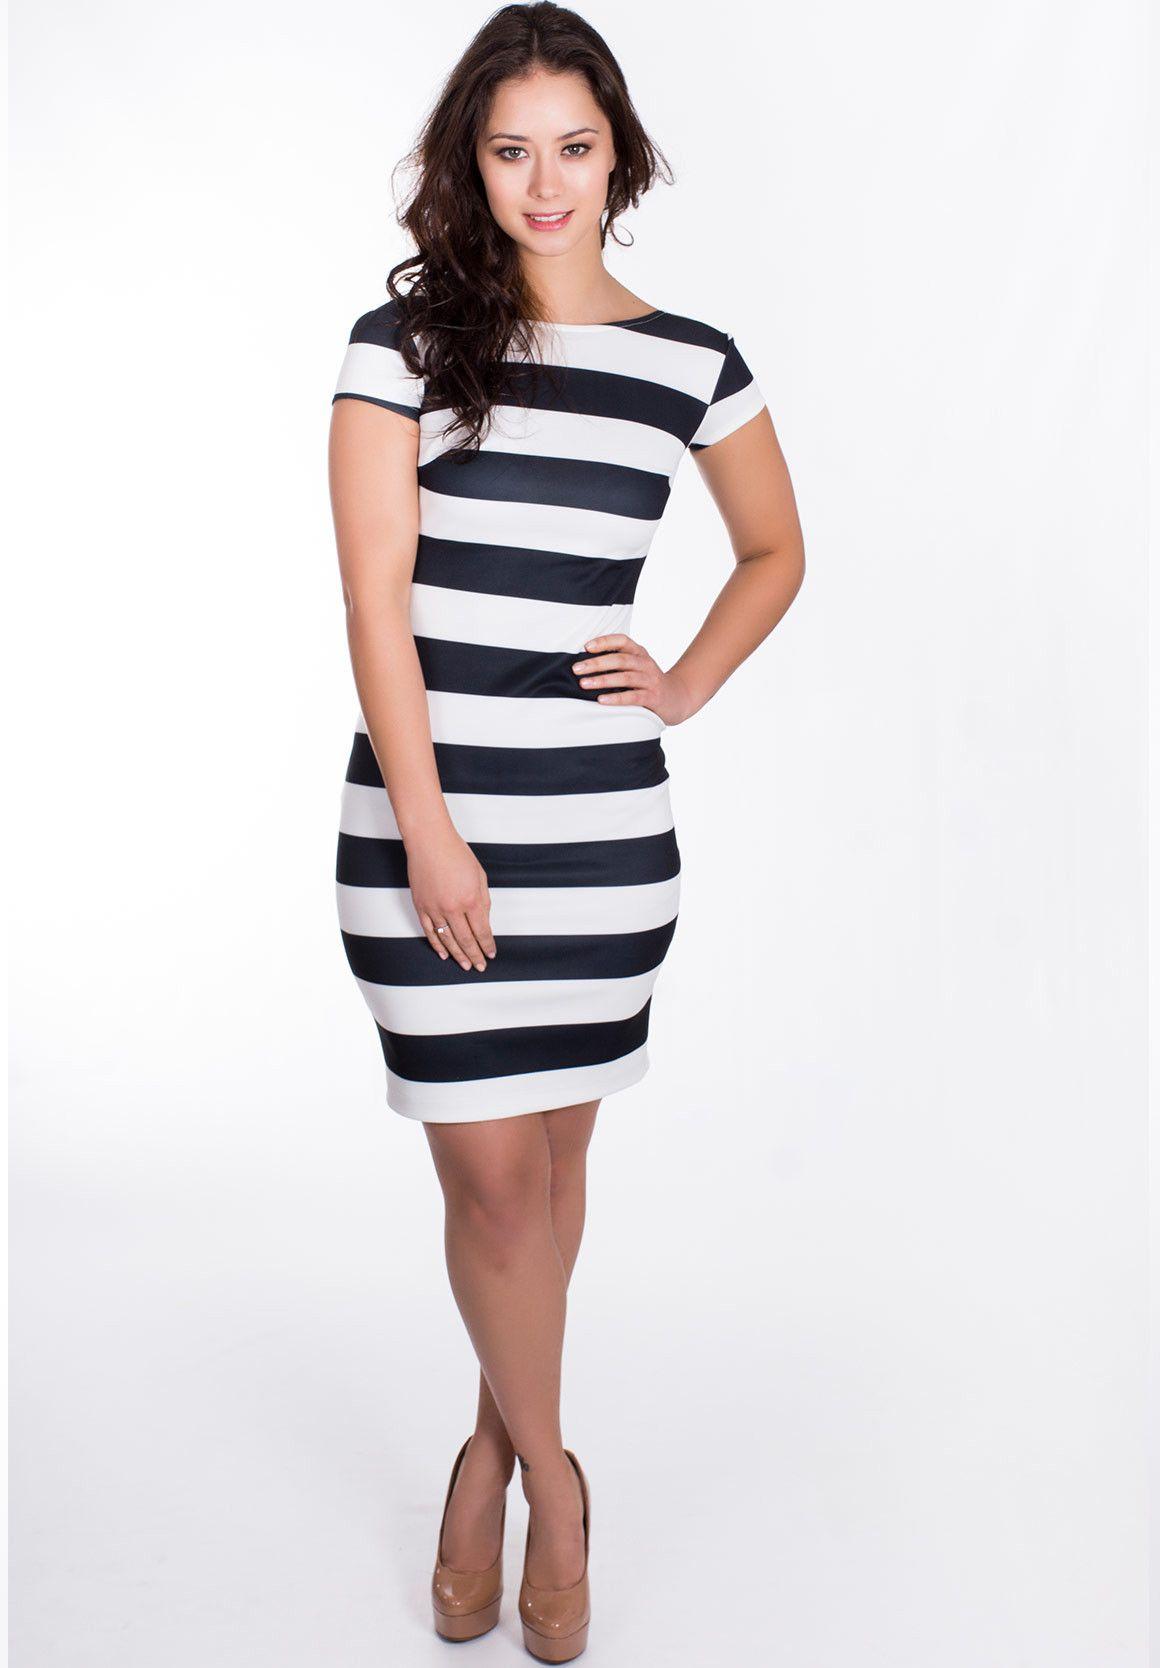 Big black and white striped bodycon dress curtains the elizabethan era